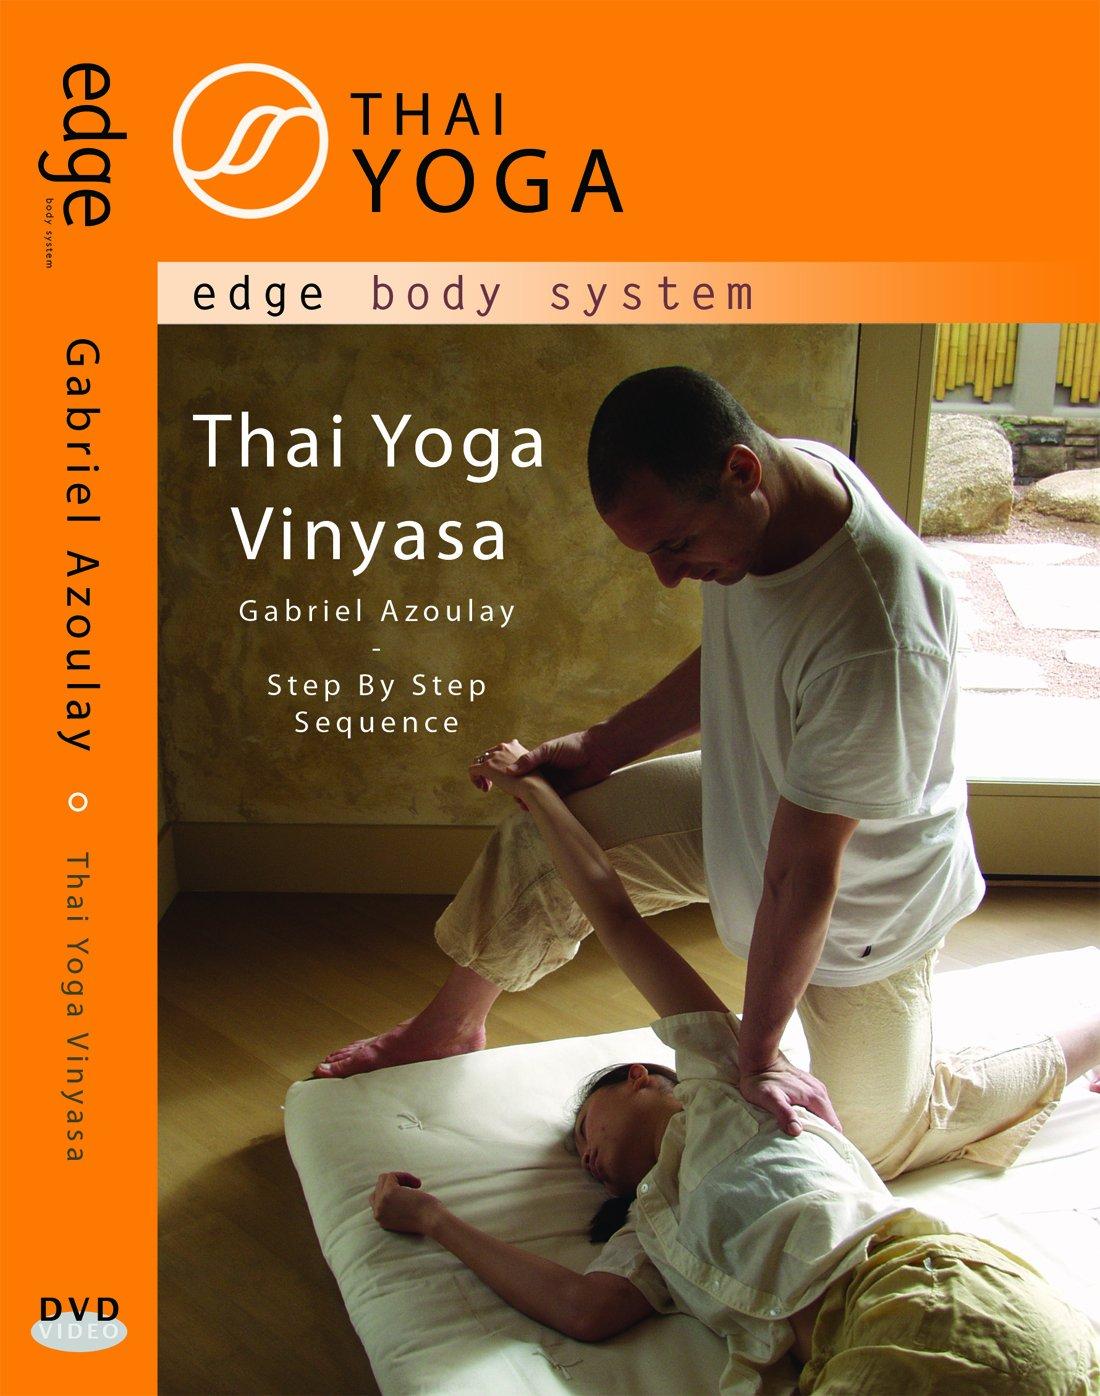 Amazon.com: Thai Yoga Vinyasa: Step by Step Sequence ...